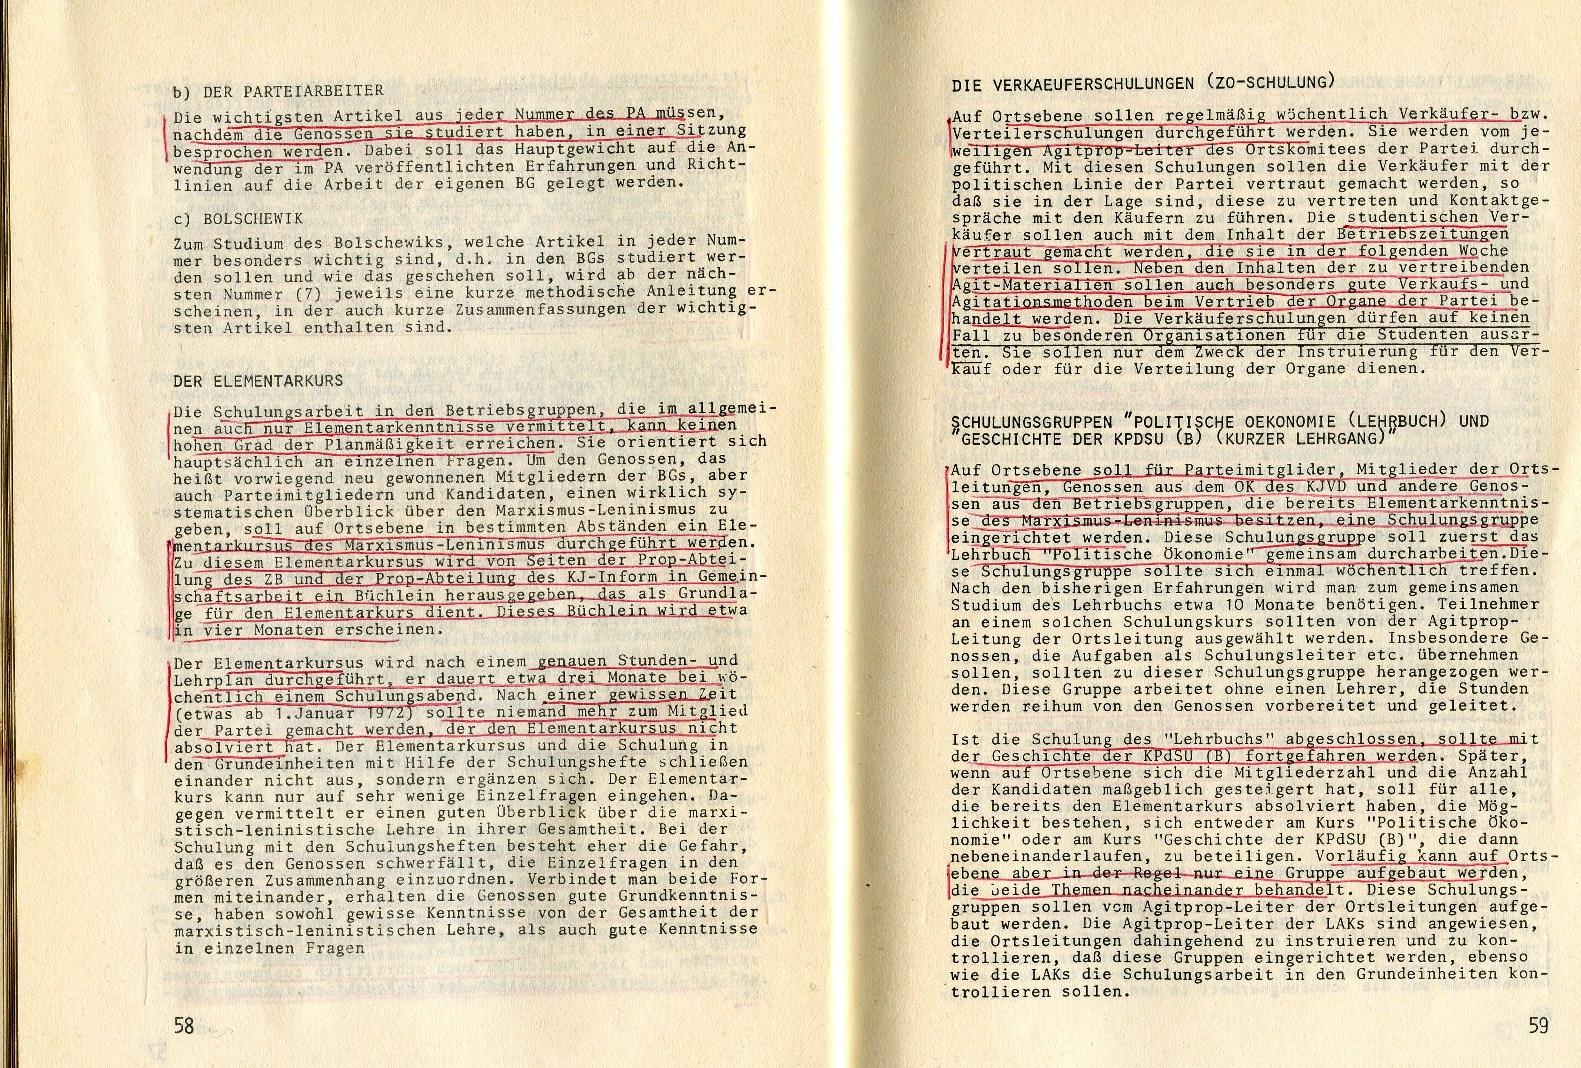 ZB_Parteiarbeiter_1971_05_31